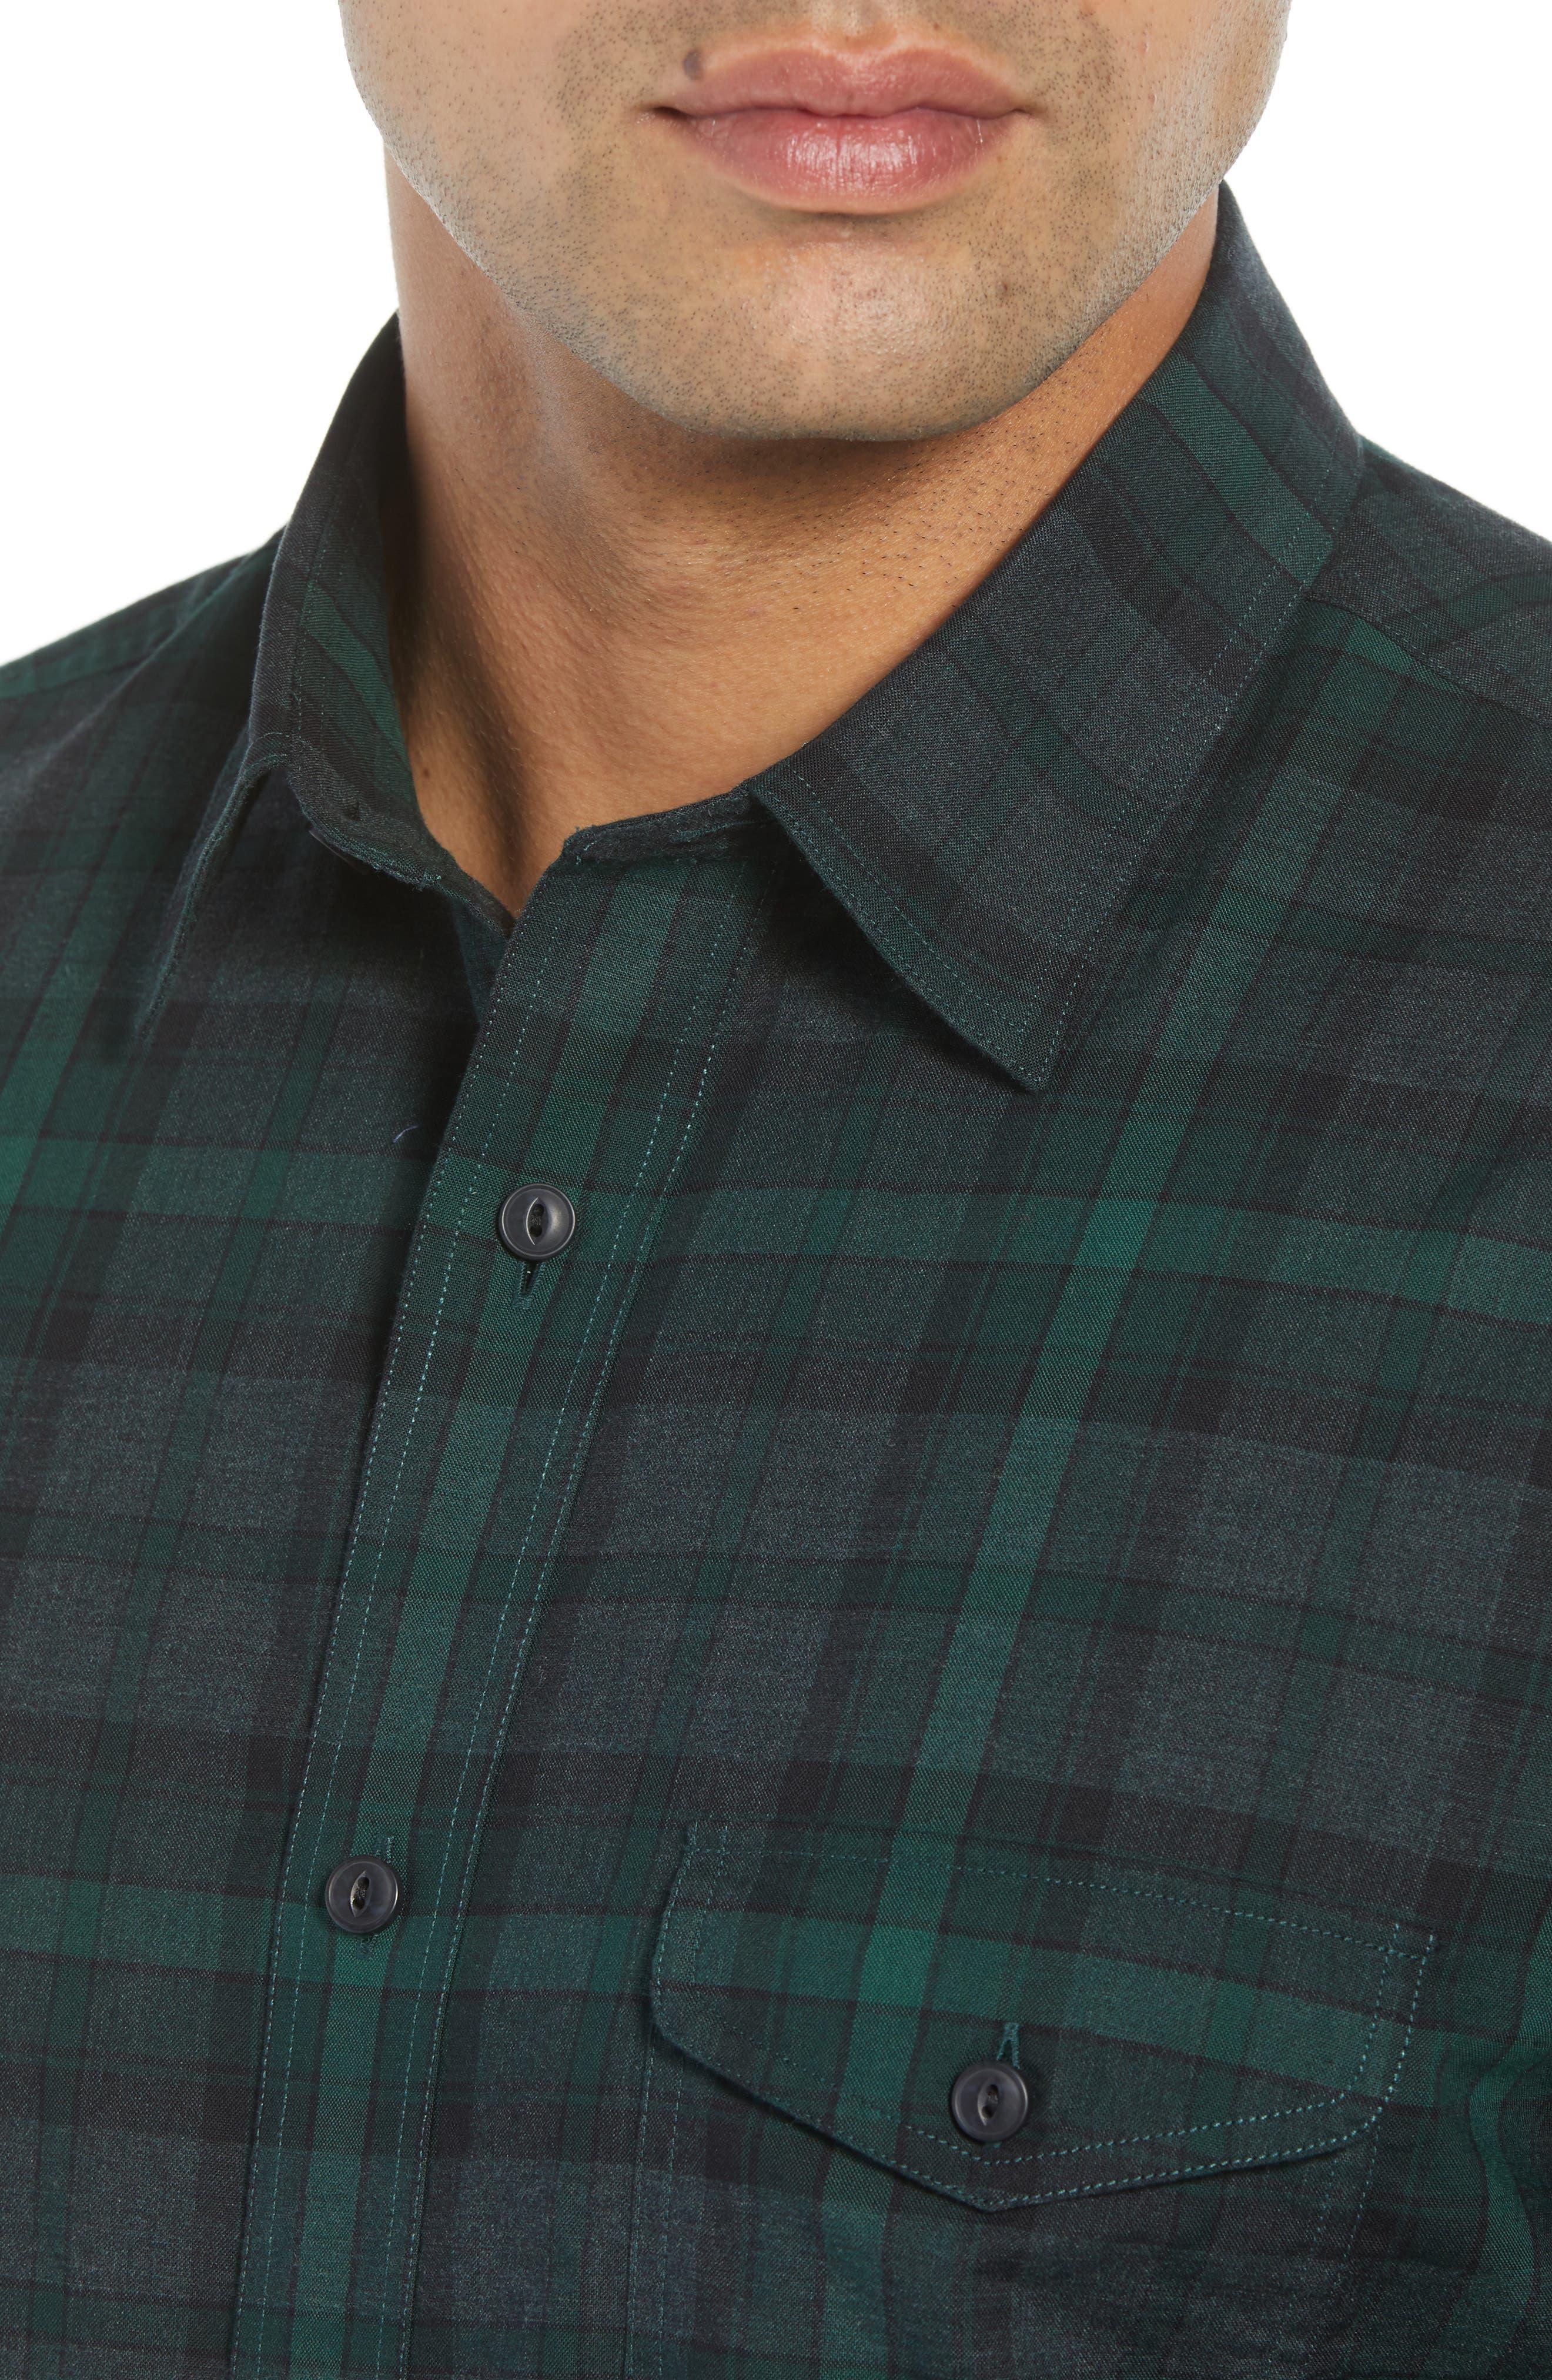 Regular Fit Plaid Flannel Sport Shirt,                             Alternate thumbnail 4, color,                             GREEN FOREST GREY PLAID